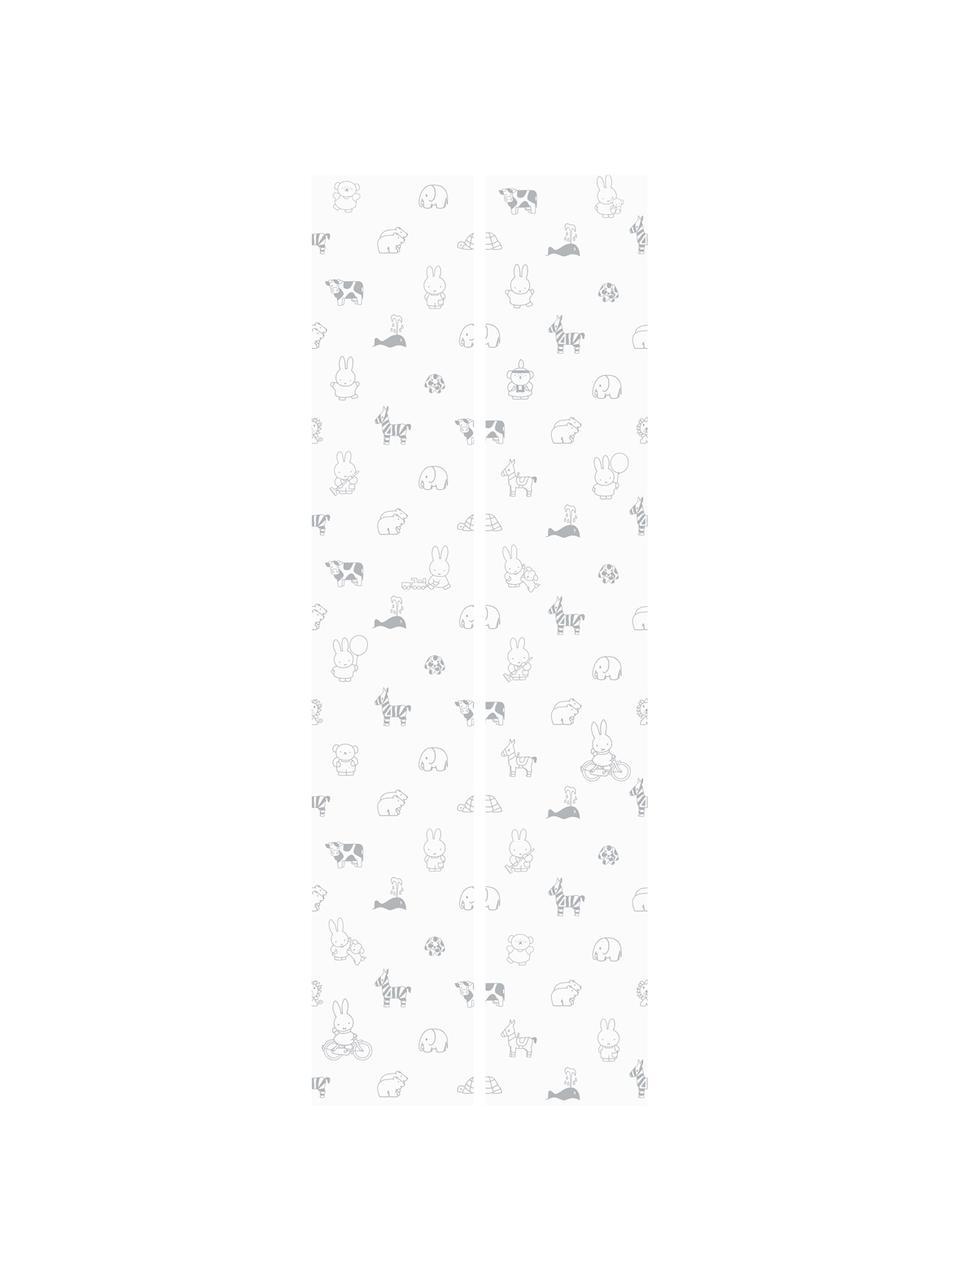 Tapete Miffy, Papier, matt, 165 g/m², Weiß, Grau, B 97 x H 280